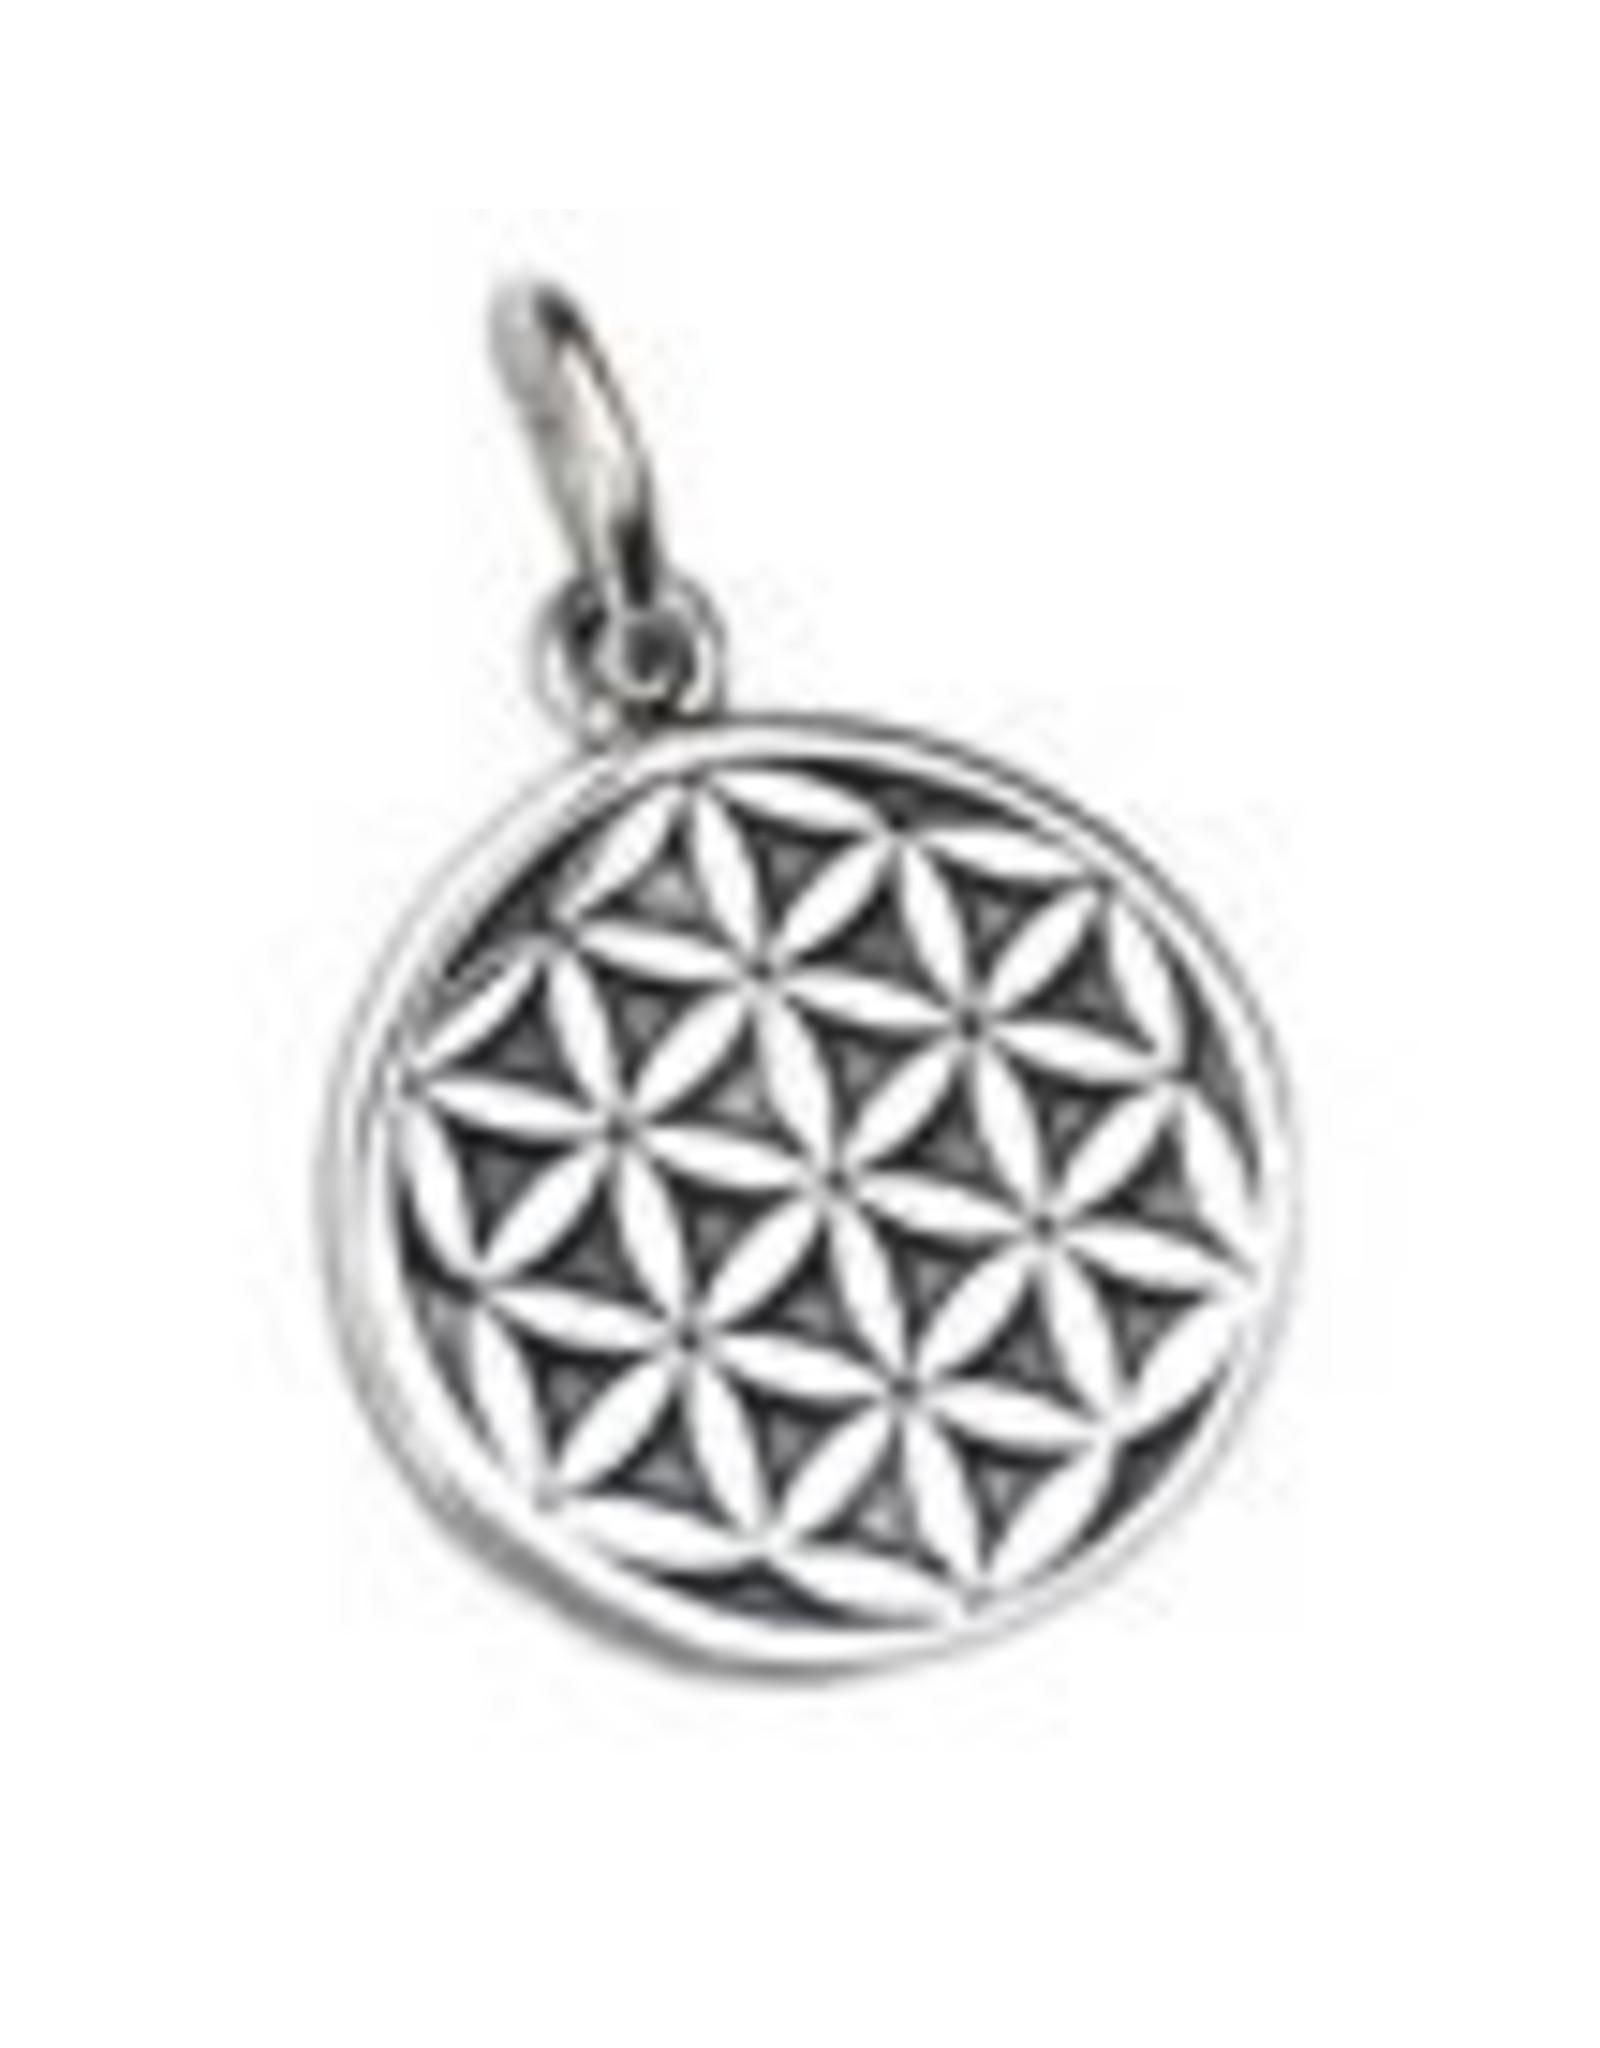 Shanti pendant Flower of Life